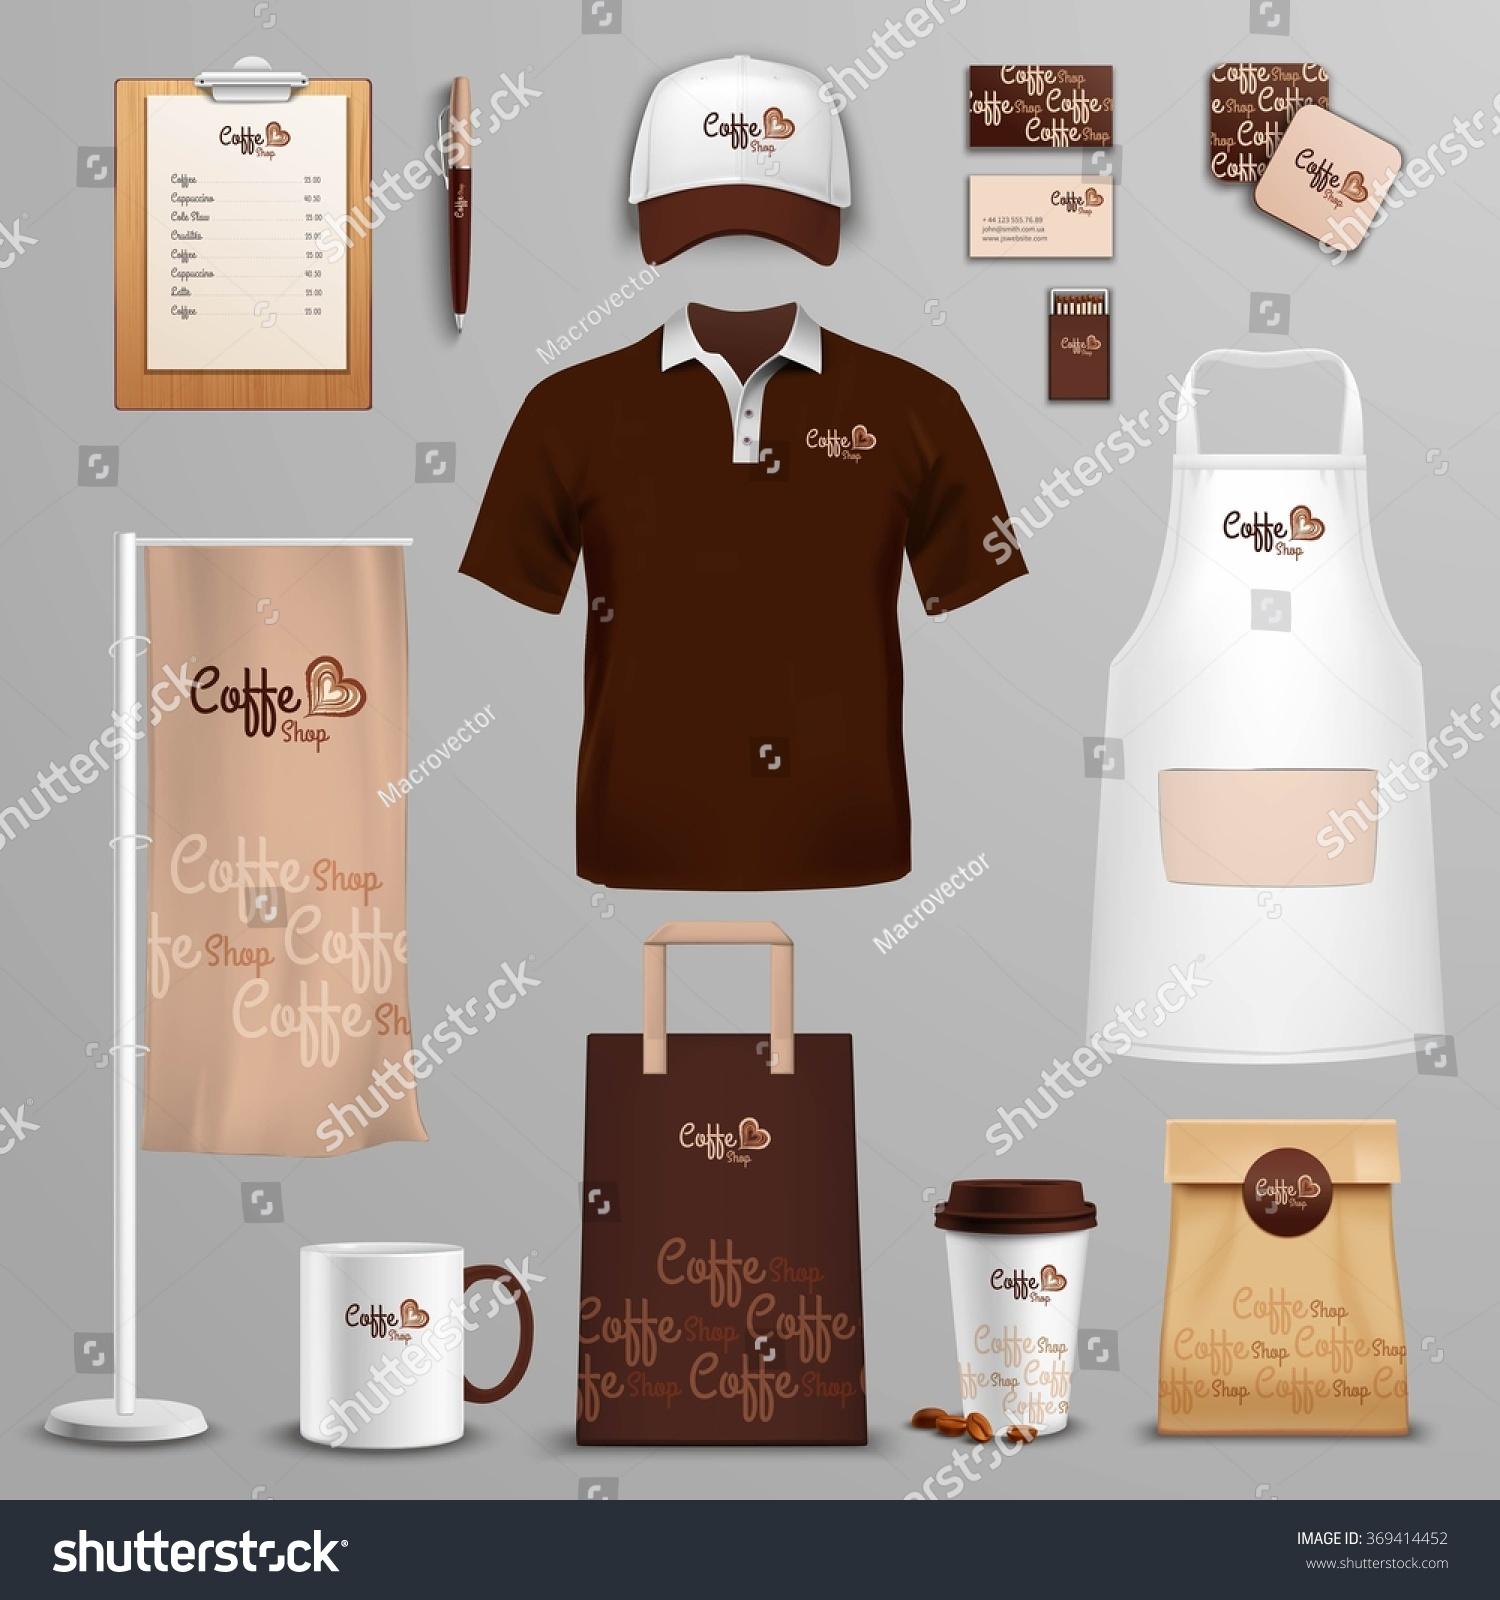 Restaurant Cafe Corporate Identity Icons Set Stock Illustration